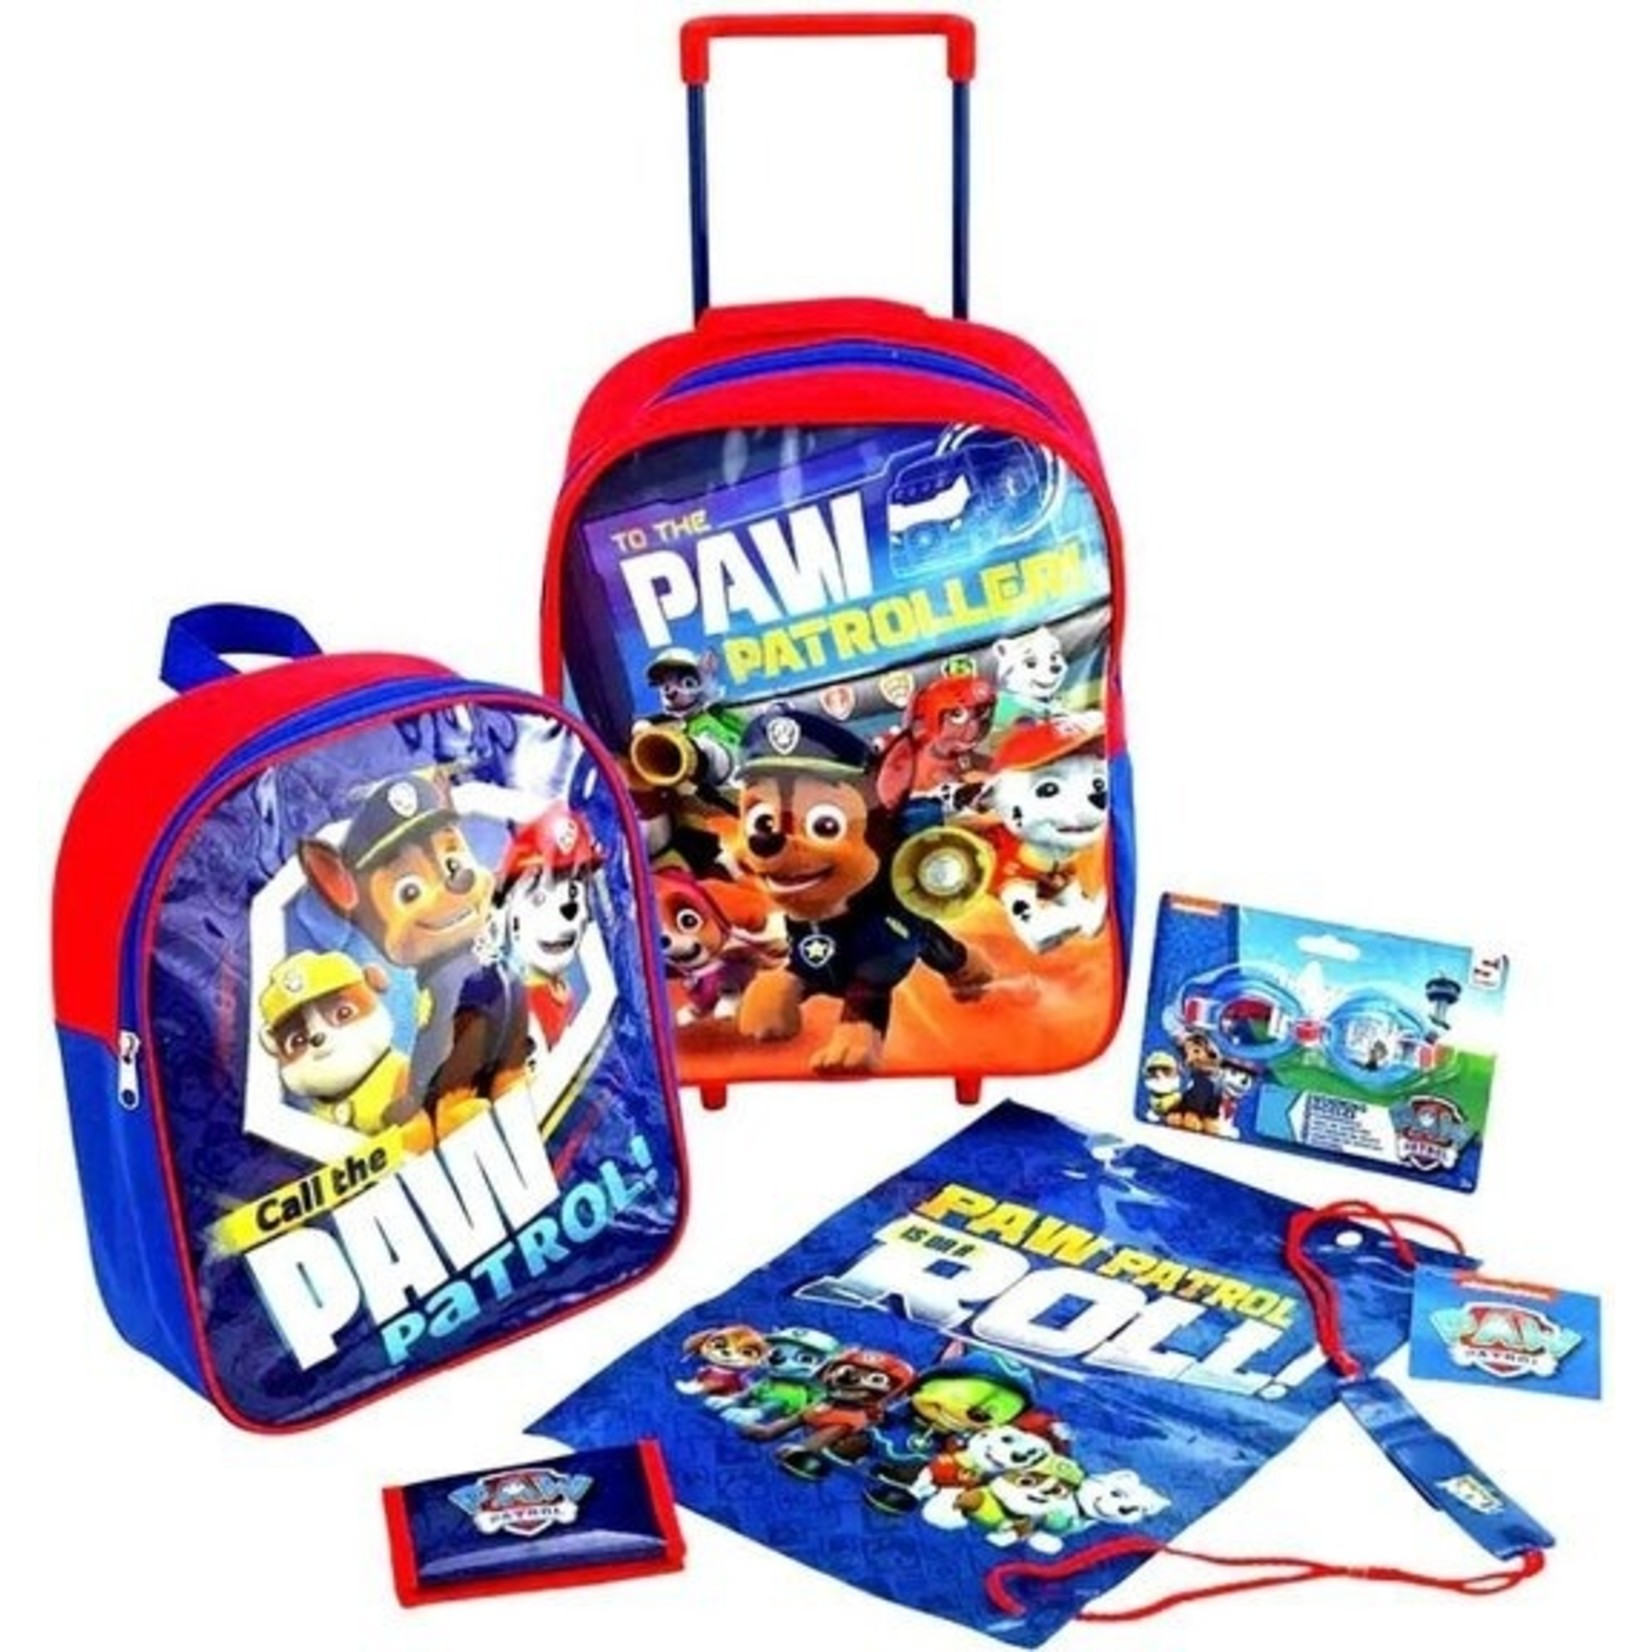 Paw patrol kofferset 5 delig